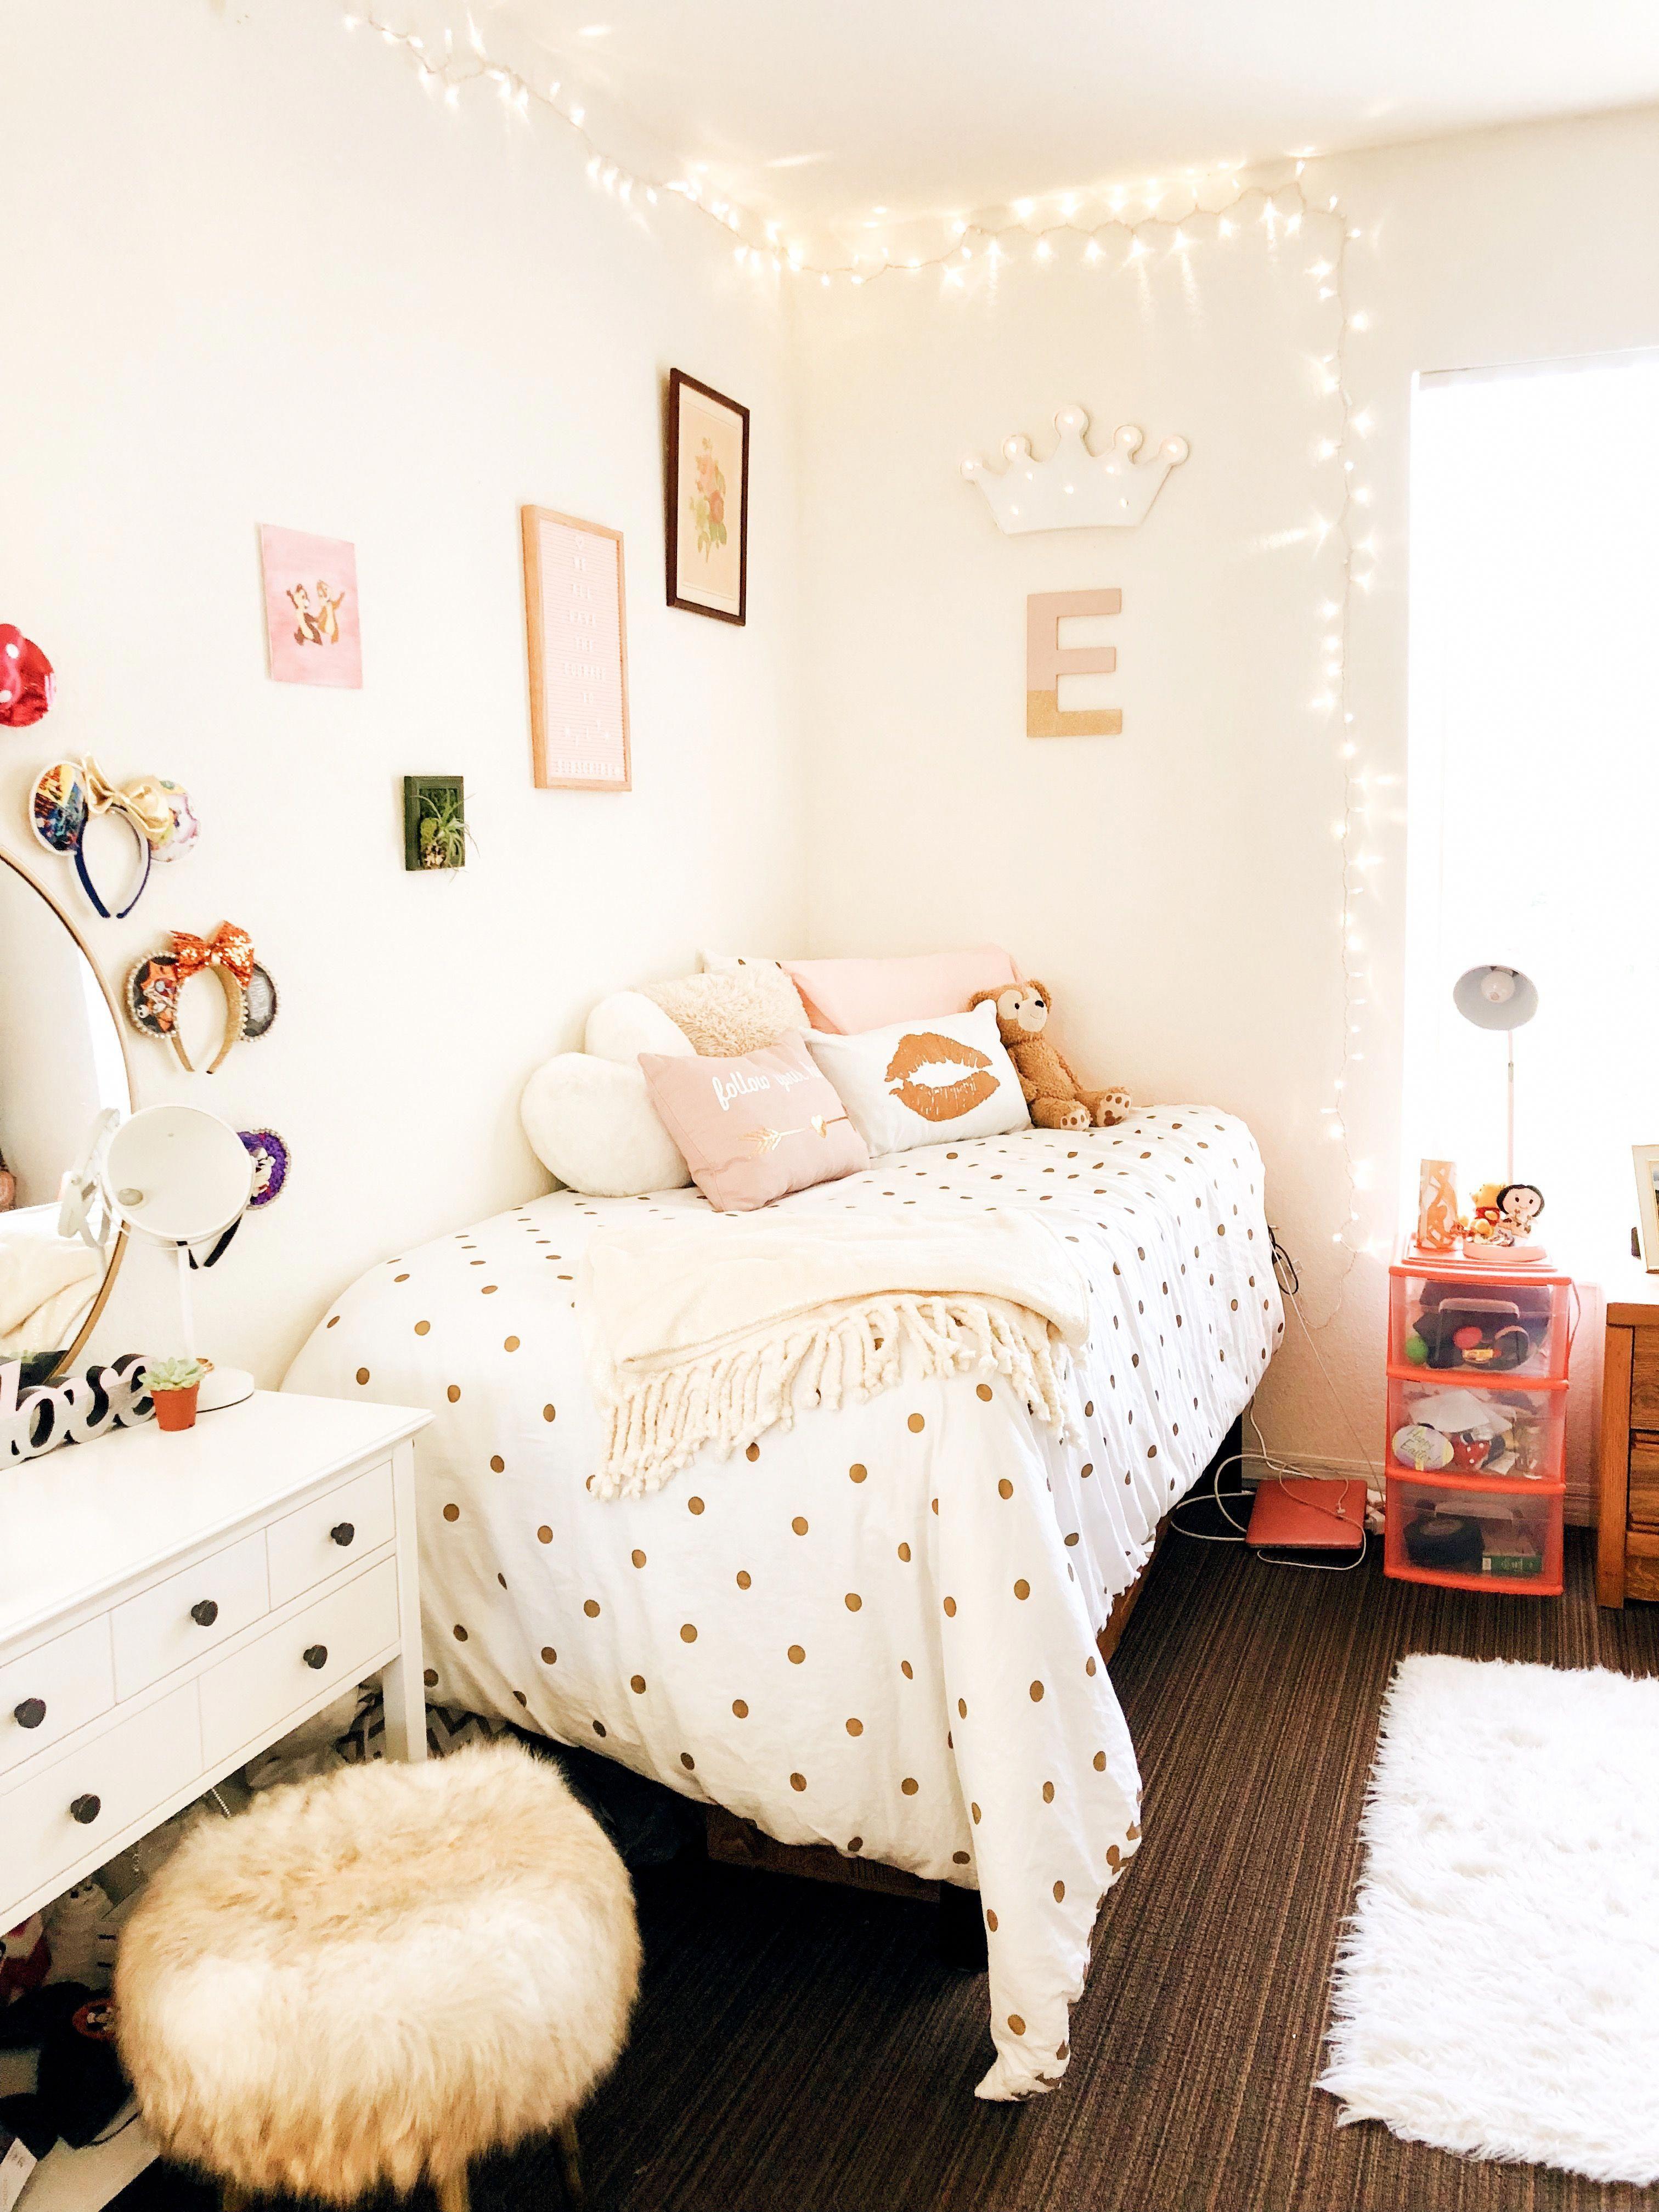 Pin by Alina De Silva on Dream House in 2019 | Disney dorm ...